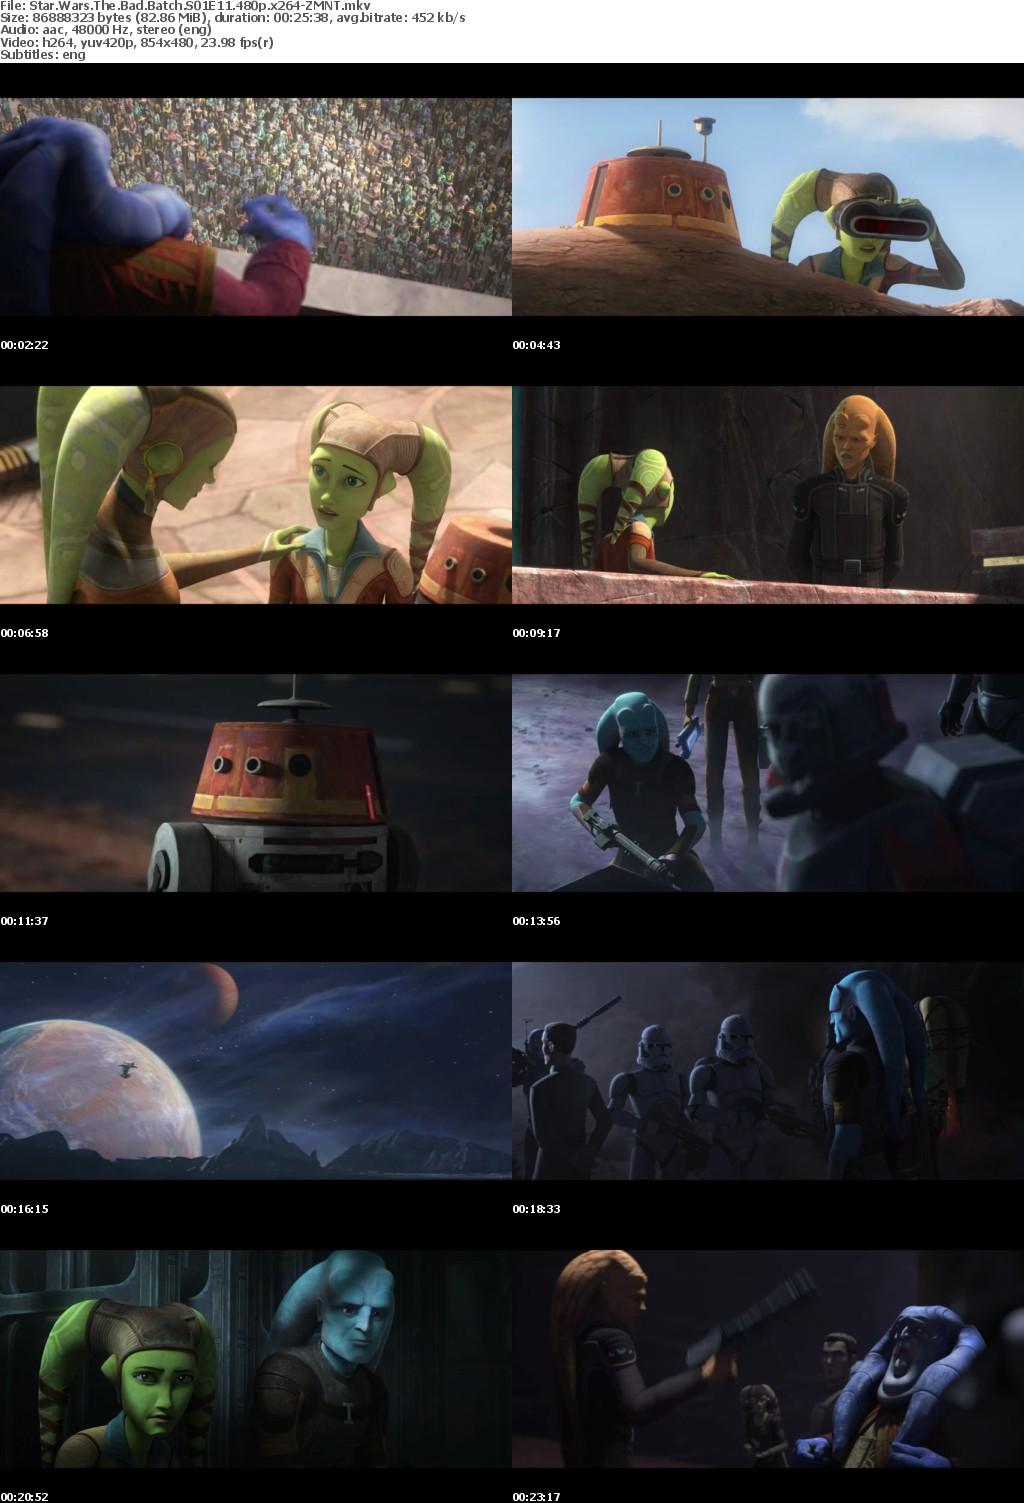 Star Wars The Bad Batch S01E11 480p x264-ZMNT